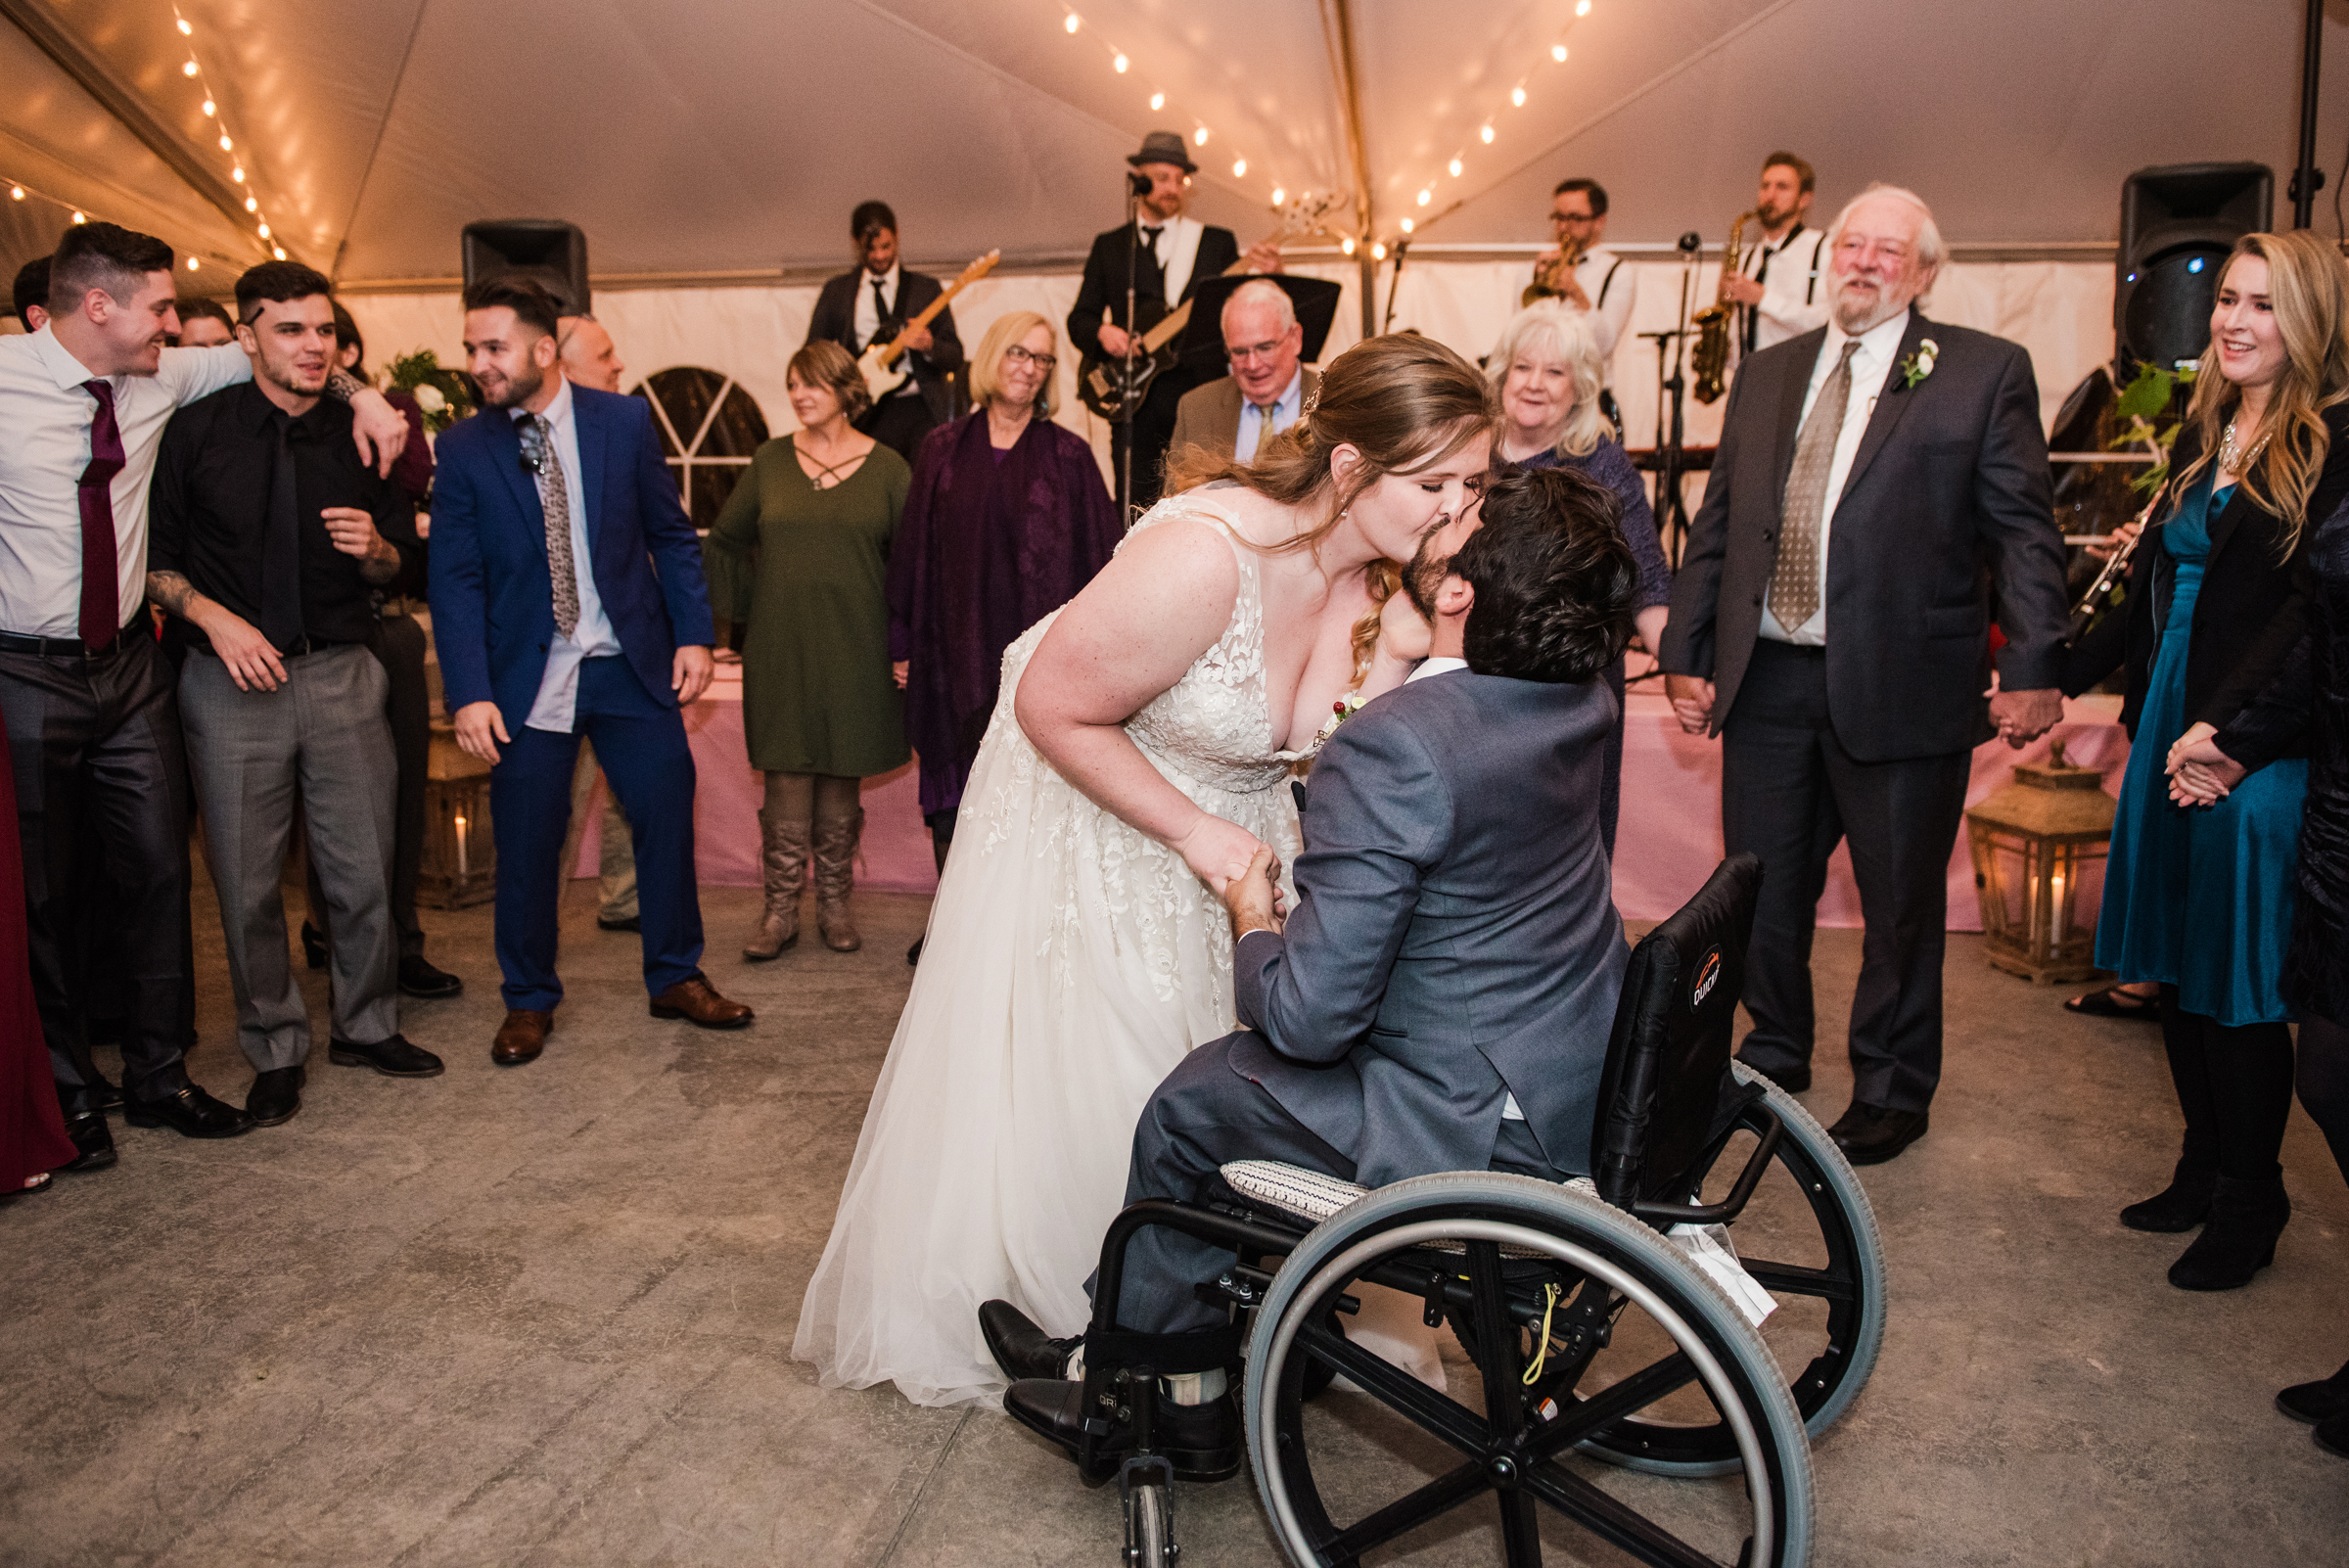 Zugibe_Vineyards_Finger_Lakes_Wedding_JILL_STUDIO_Rochester_NY_Photographer_DSC_4430.jpg